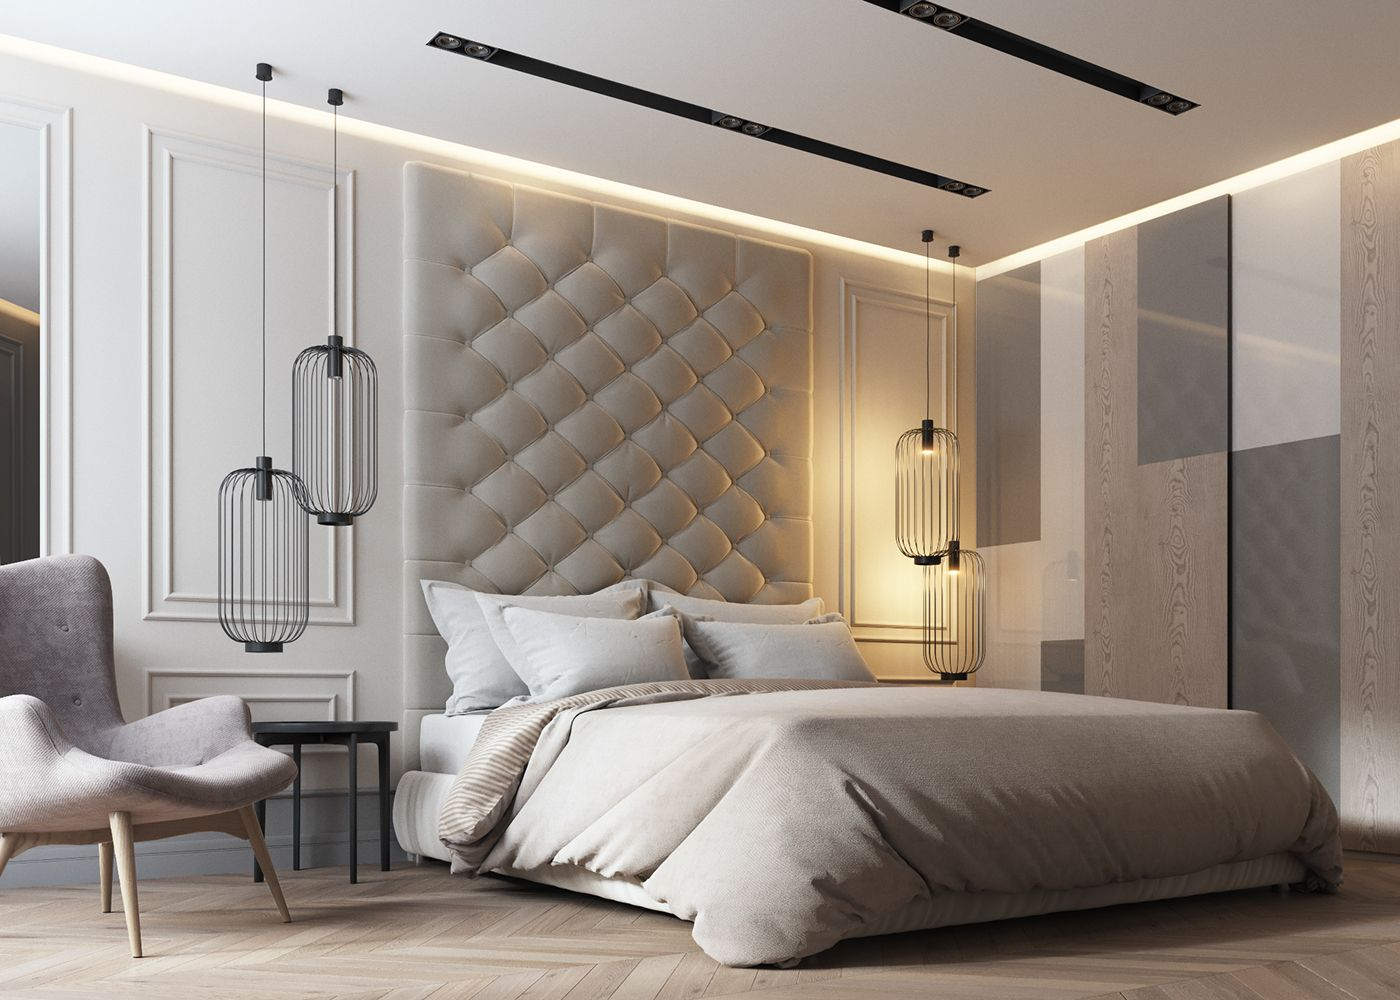 Oznakomtes S Etim Proektom Behance Apartments In Ukraine